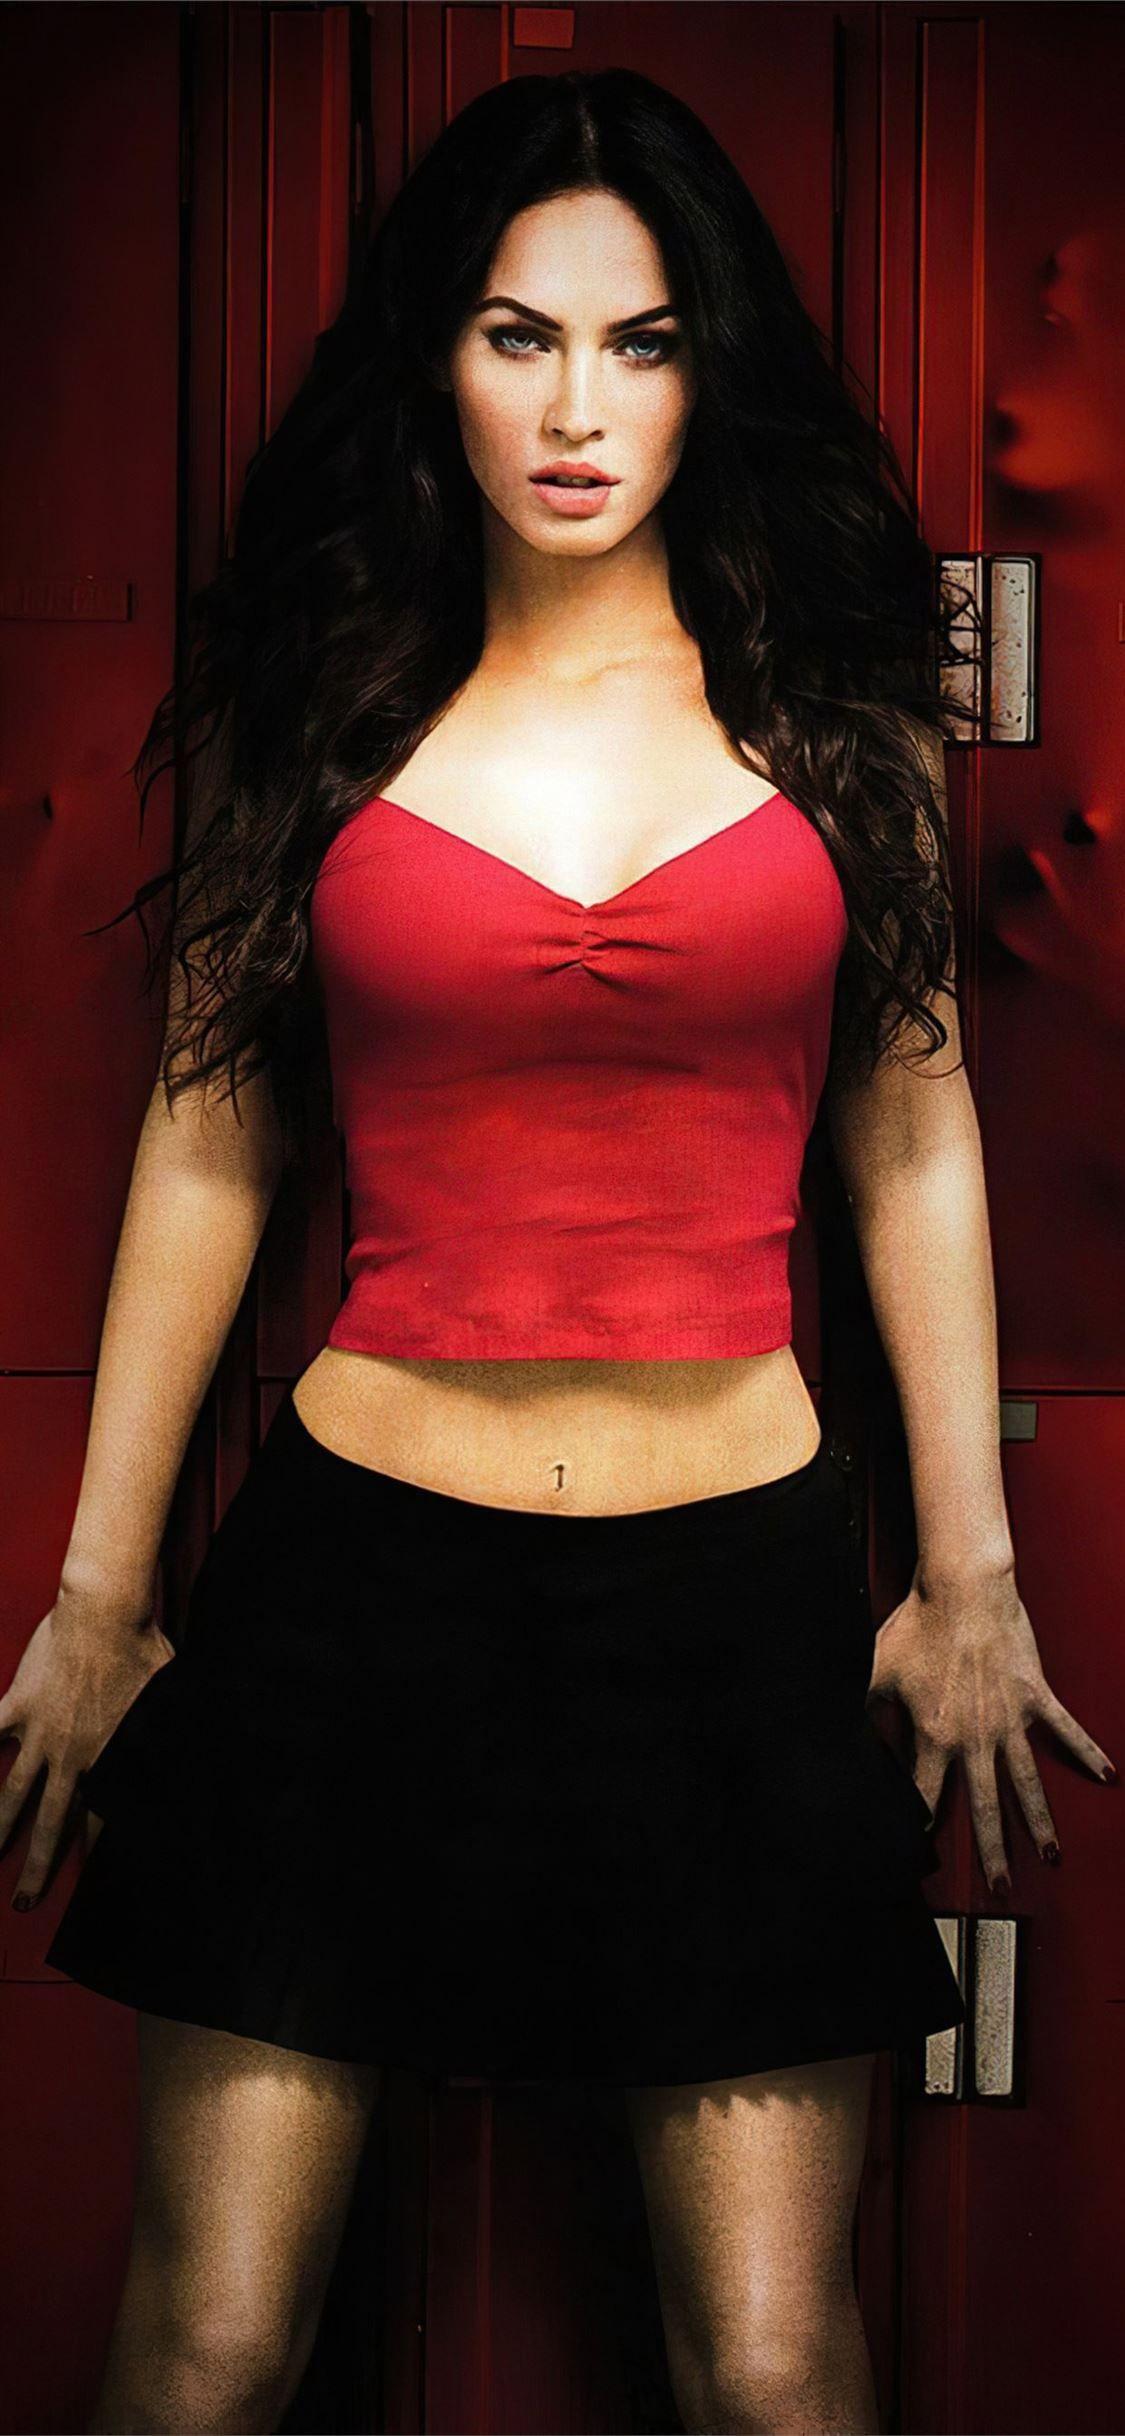 Megan Fox iPhone Wallpapers - Top Free Megan Fox iPhone ...